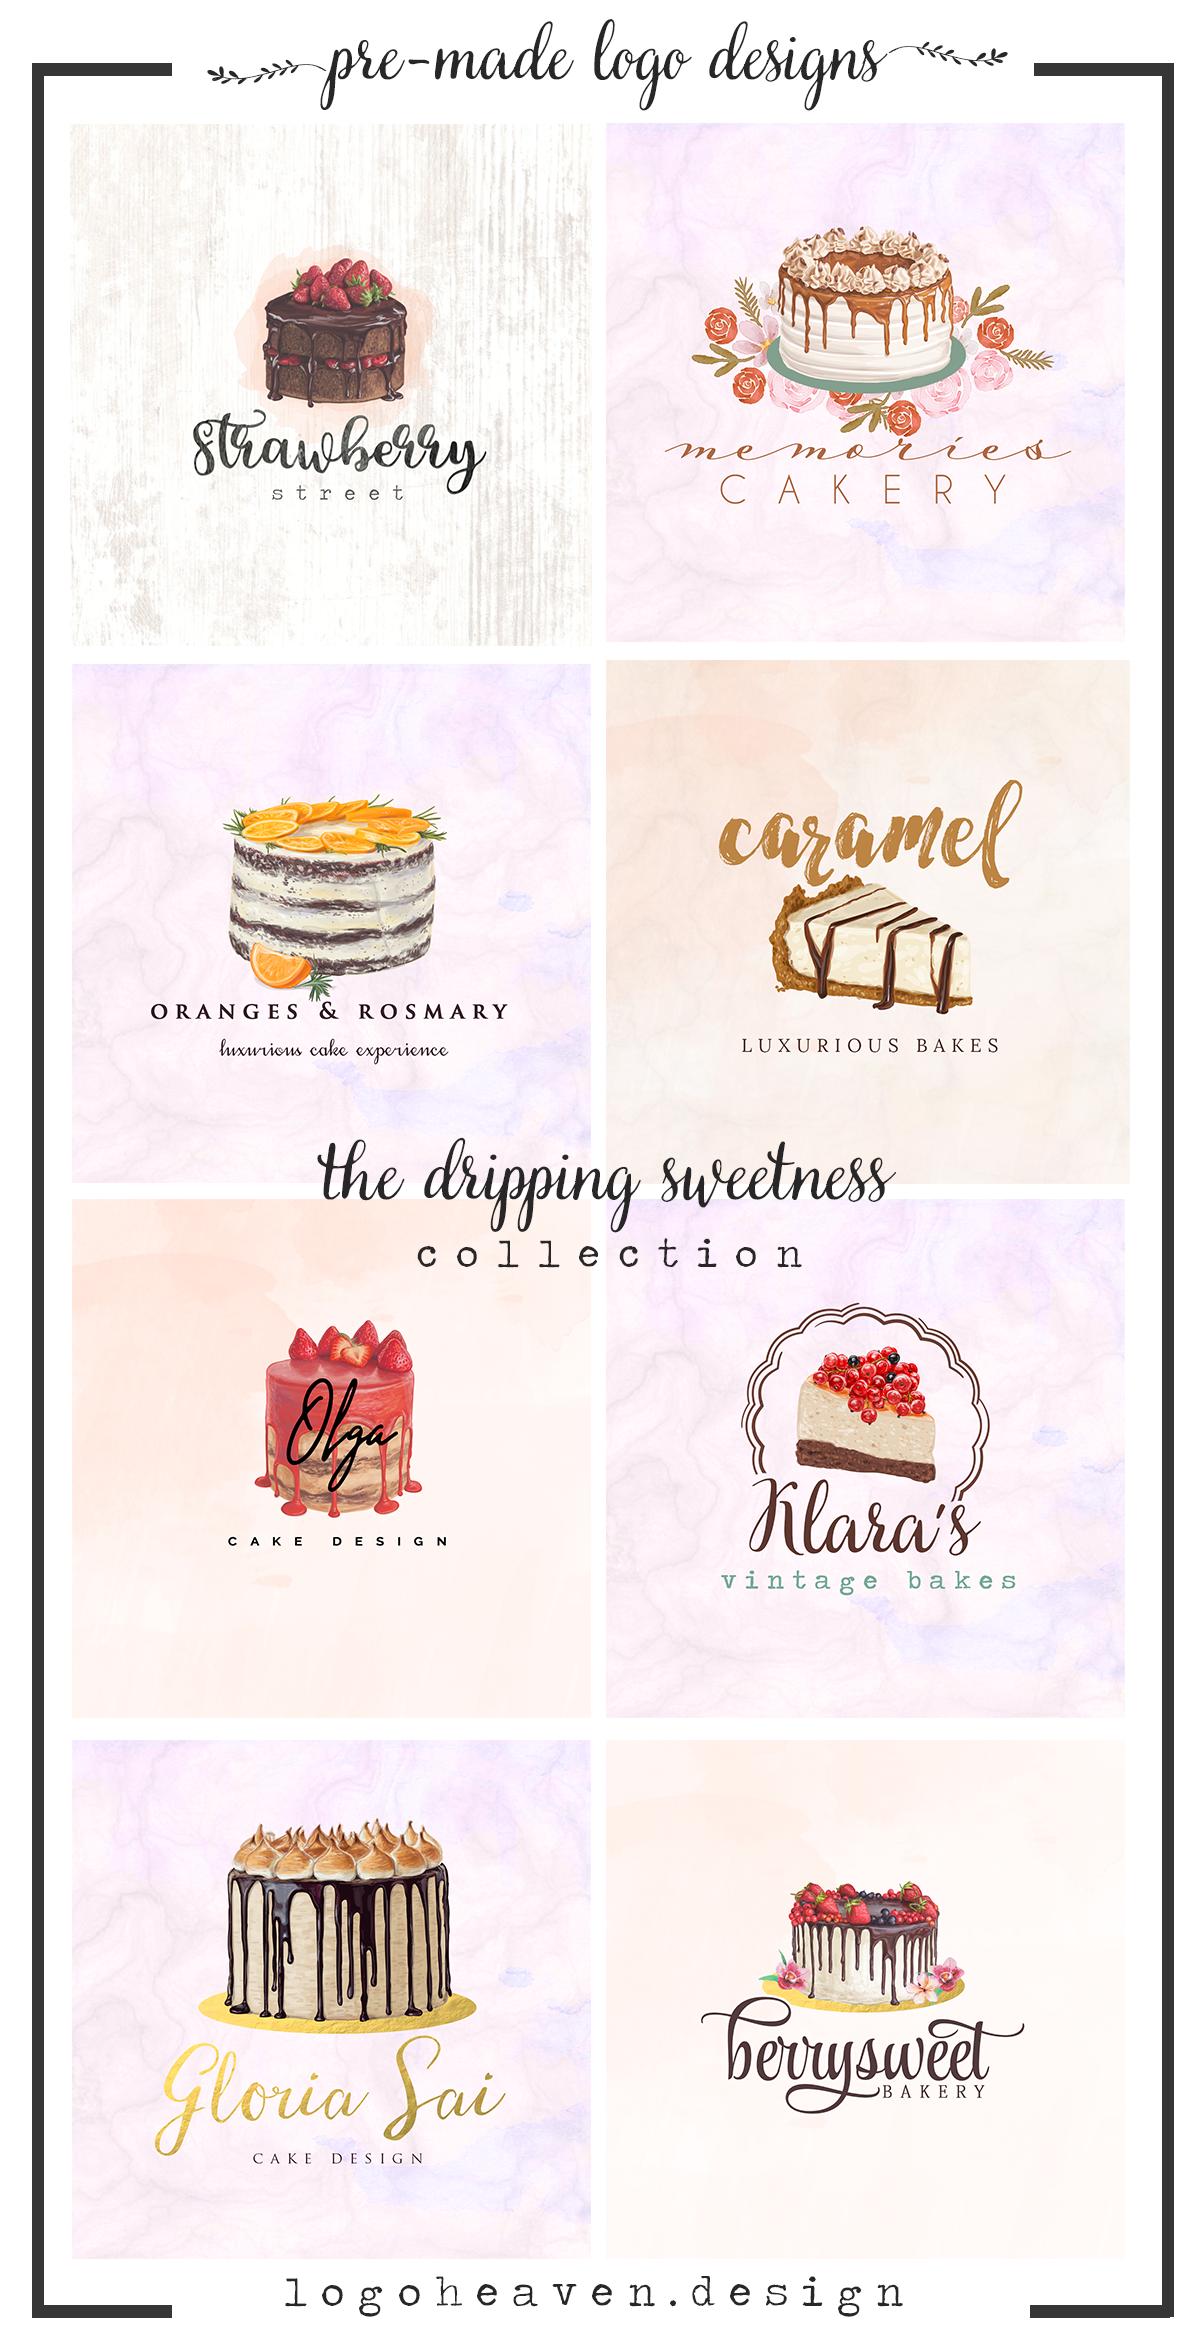 the dripping sweetness collection beautiful cakery bakery pre made logo designs makanan dan minuman makanan kue beautiful cakery bakery pre made logo